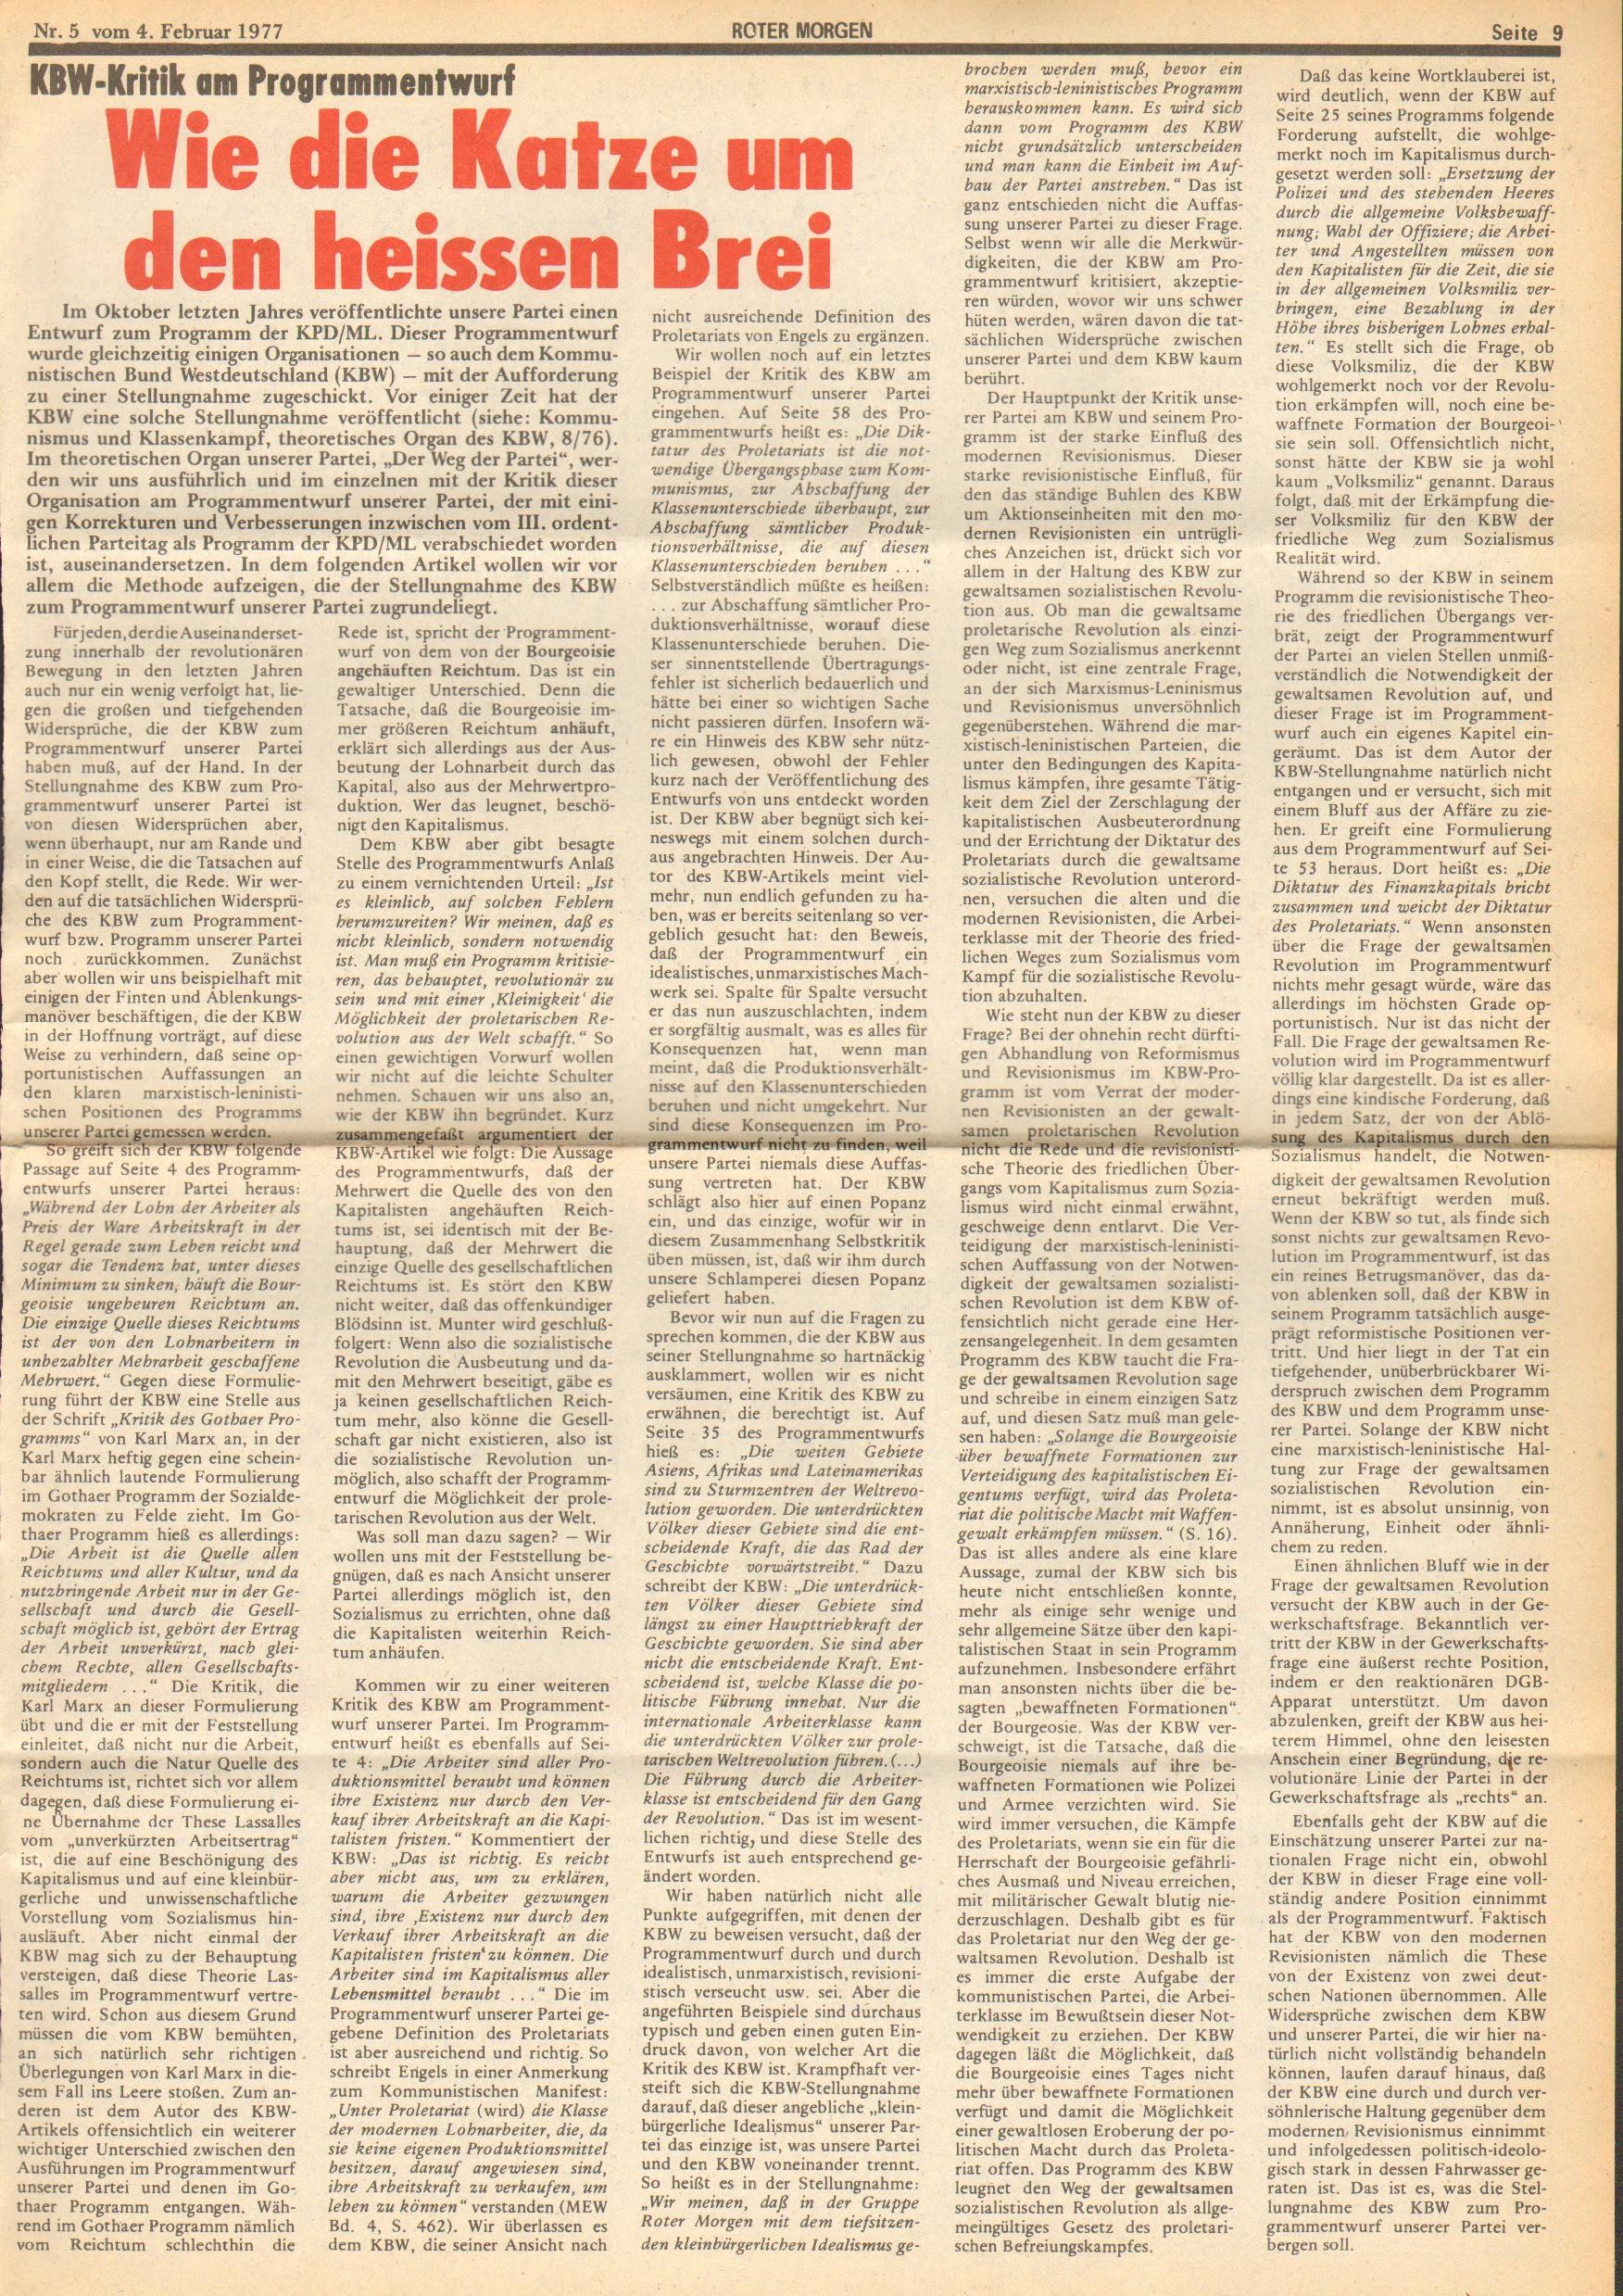 Roter Morgen, 11. Jg., 4. Februar 1977, Nr. 5, Seite 9